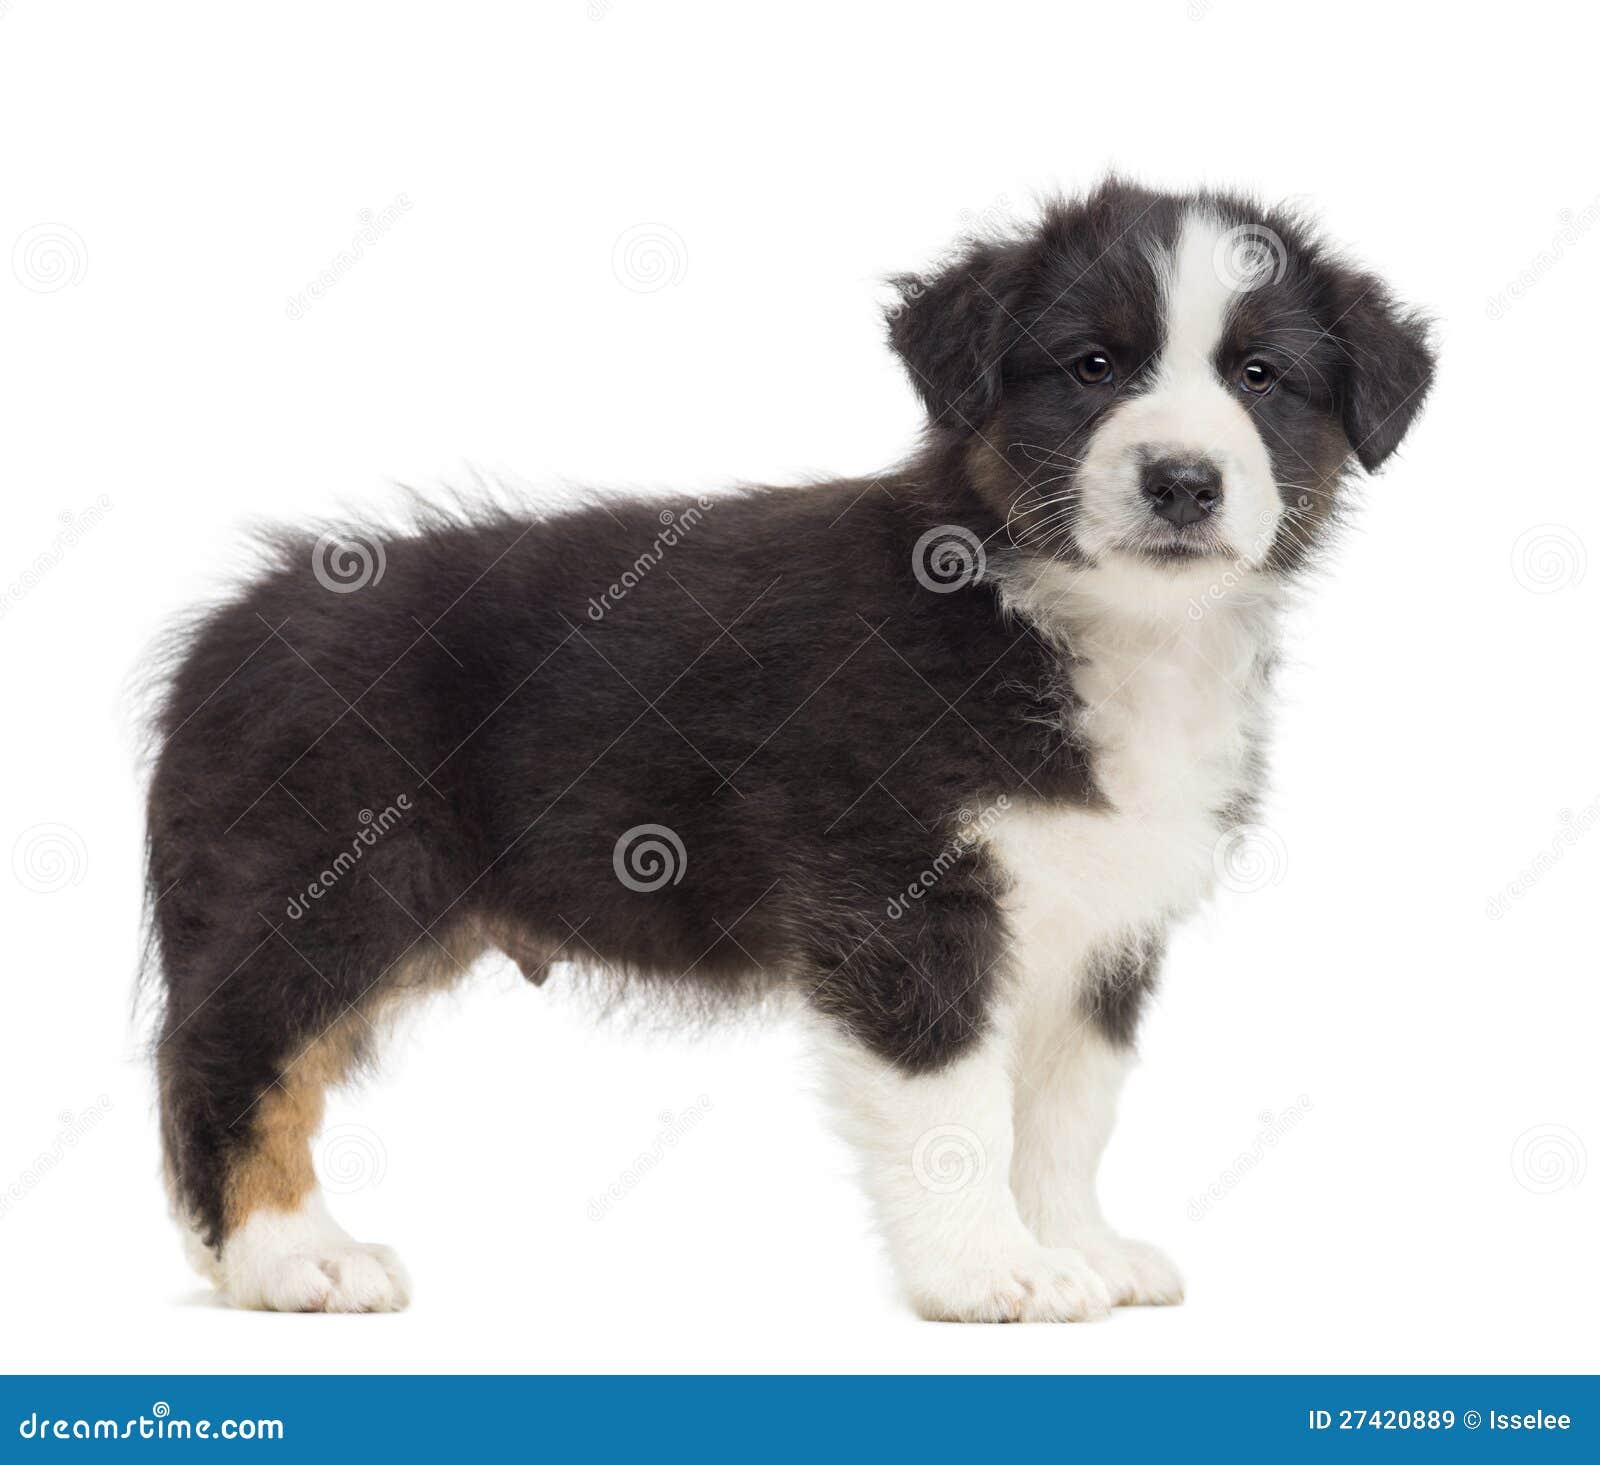 Royalty Free Stock Images: Australian Shepherd puppy, 8 weeks old ...